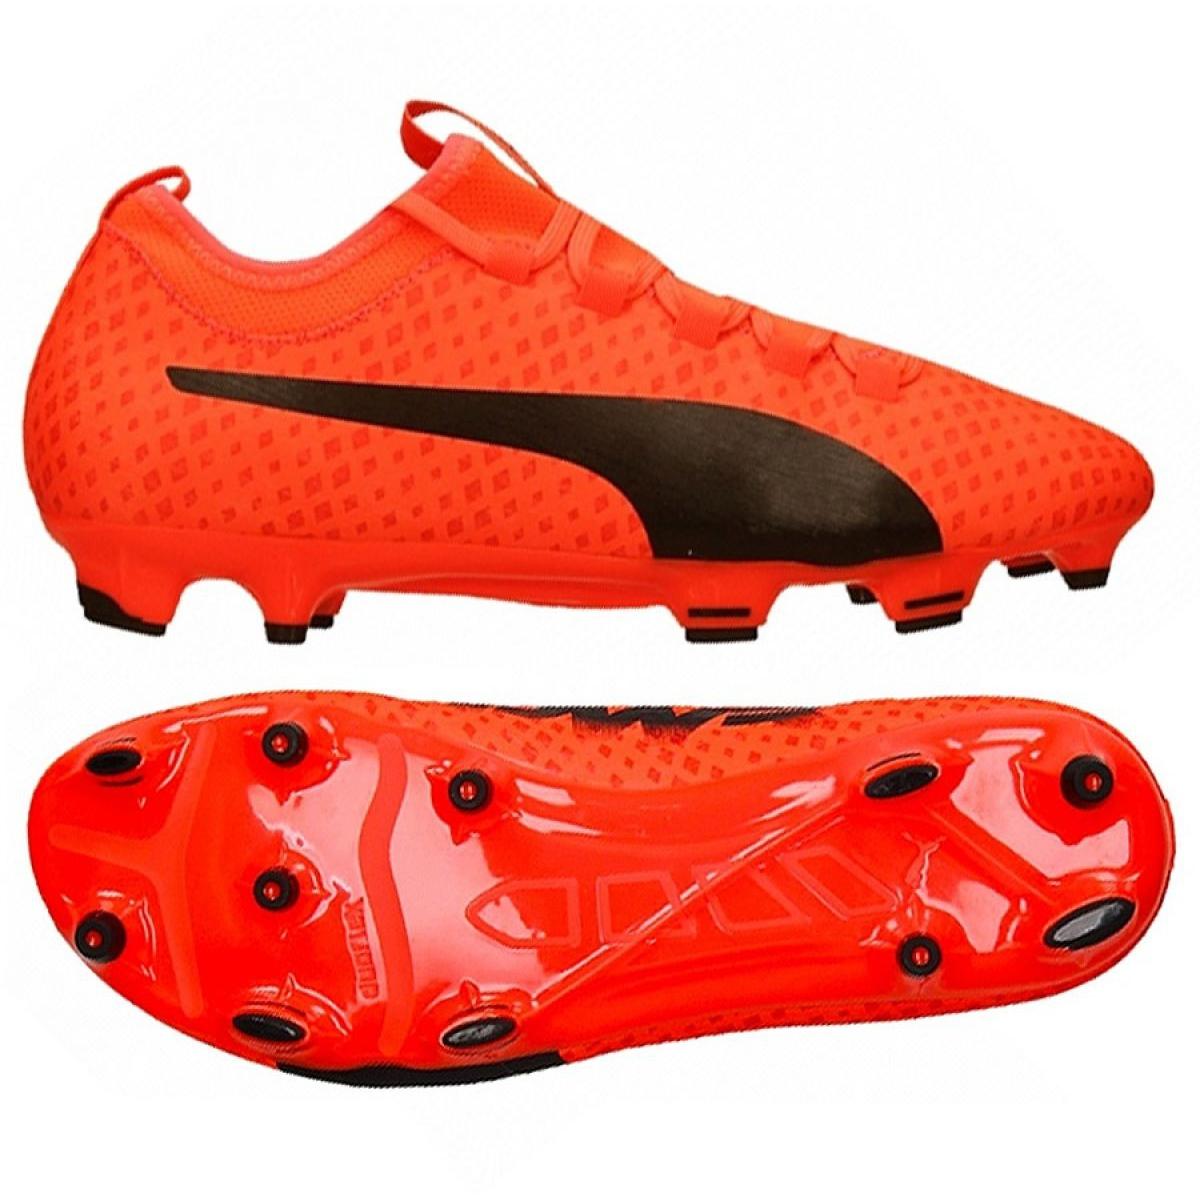 Football boots Puma Evo Power Vigor 3